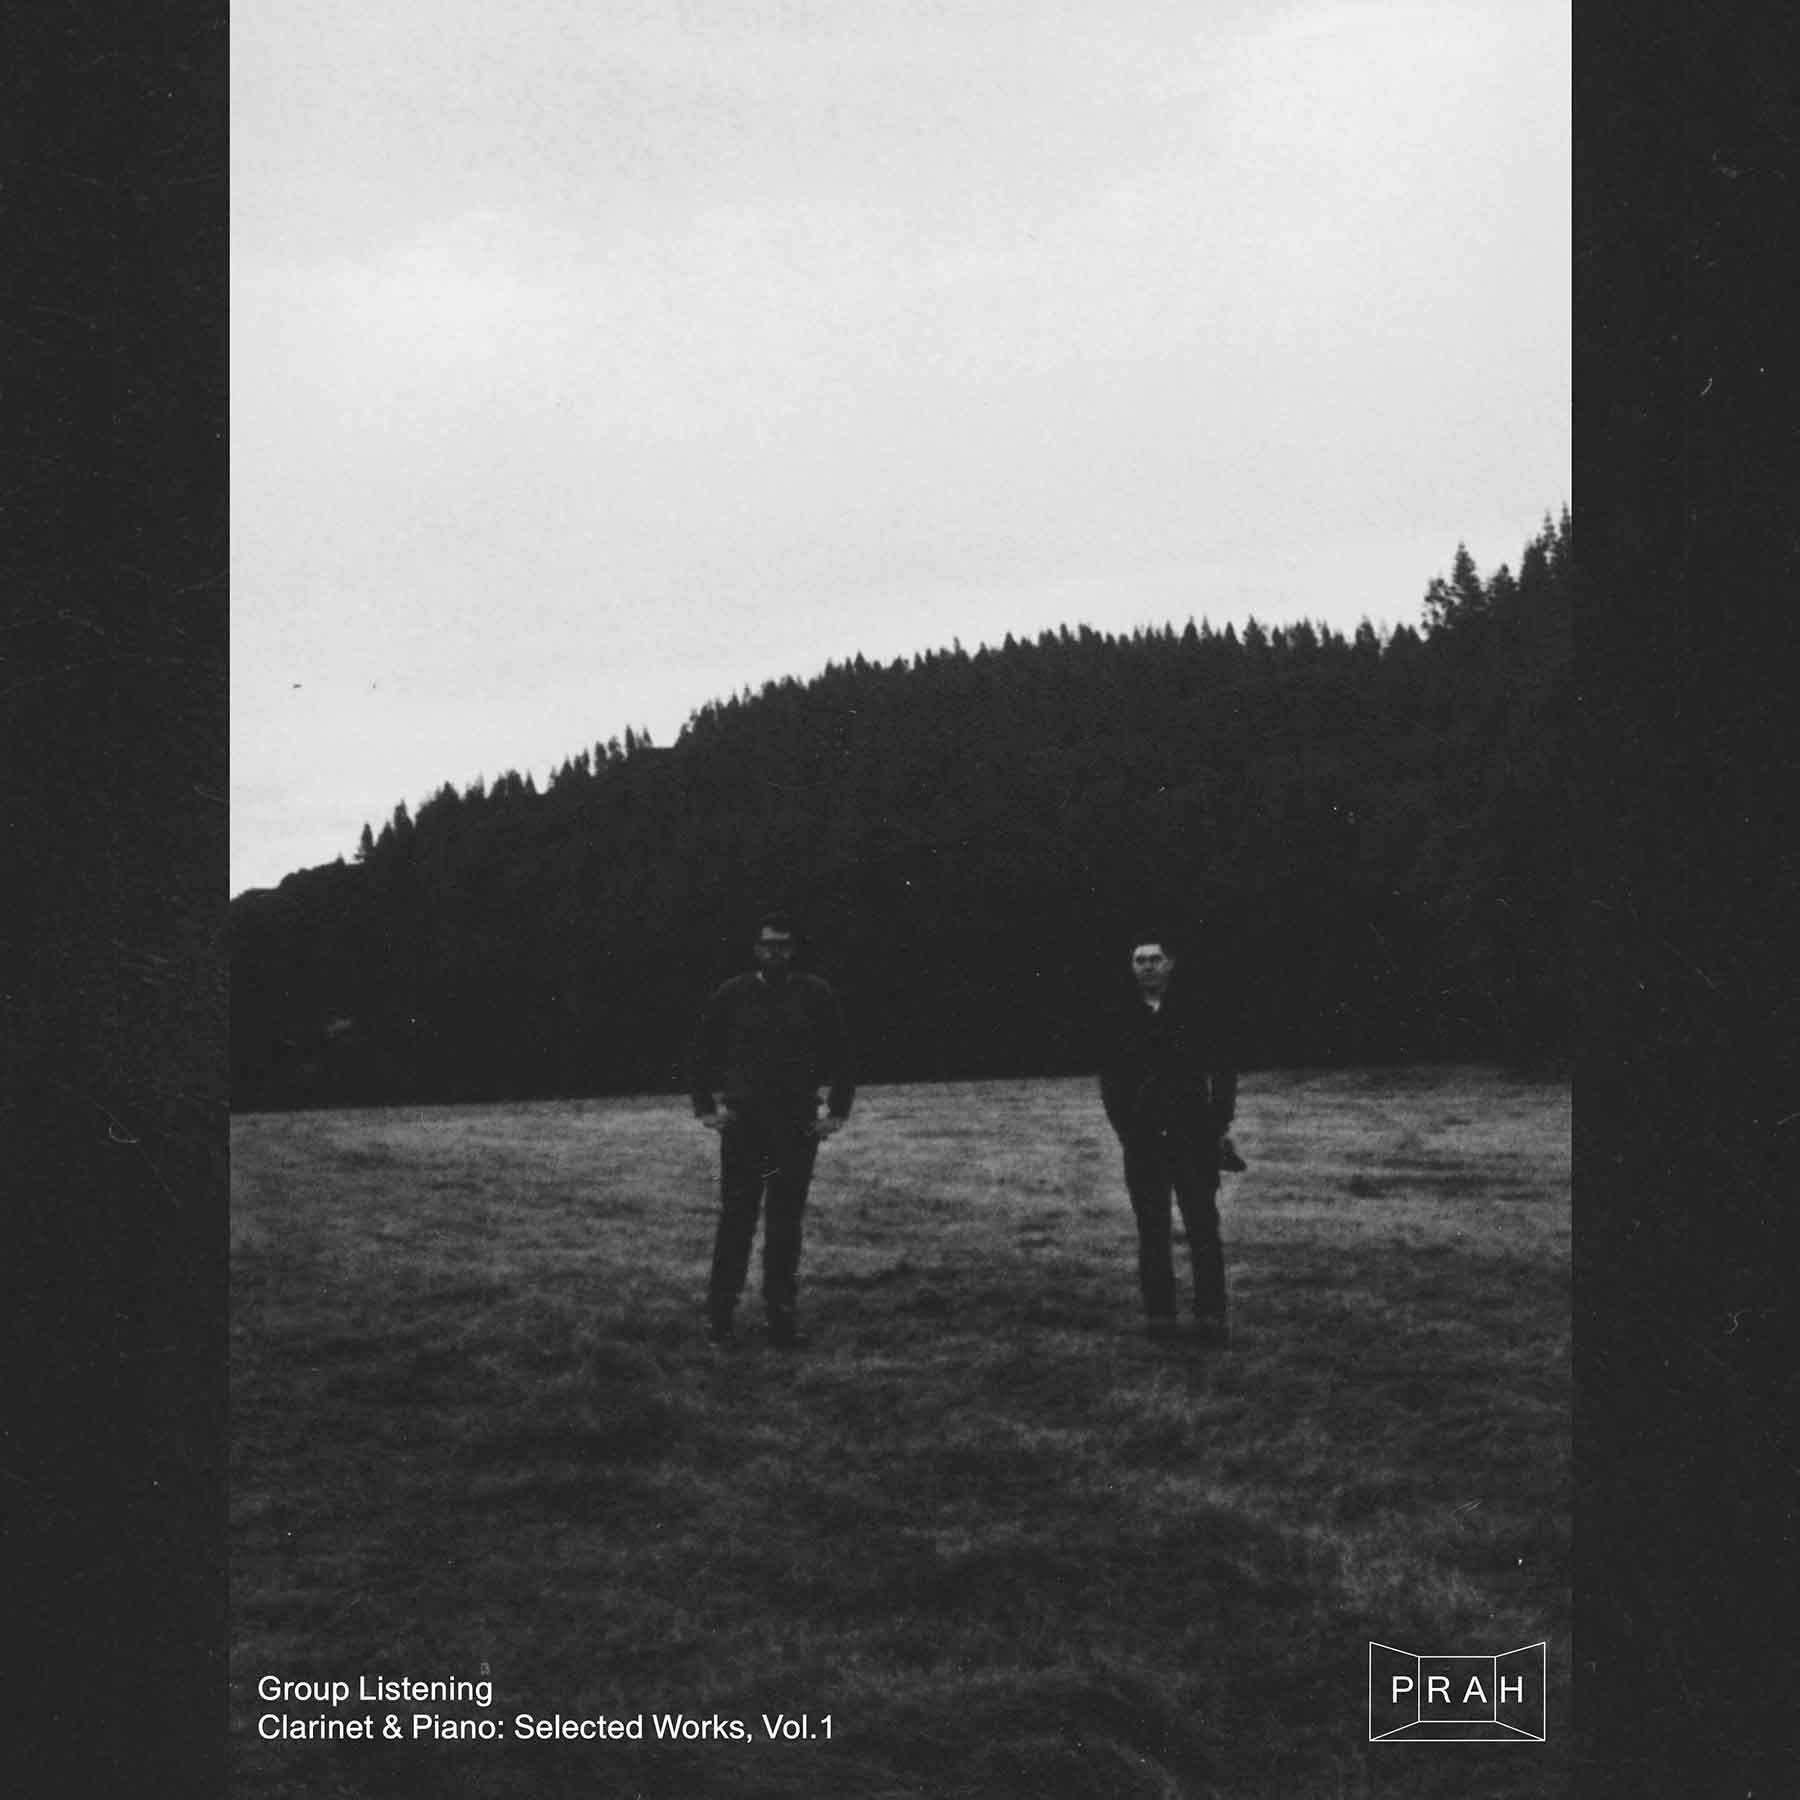 Group Listening - Clarinet & Piano: Selected Works Vol. 1 (LP) - PRAH Recordings